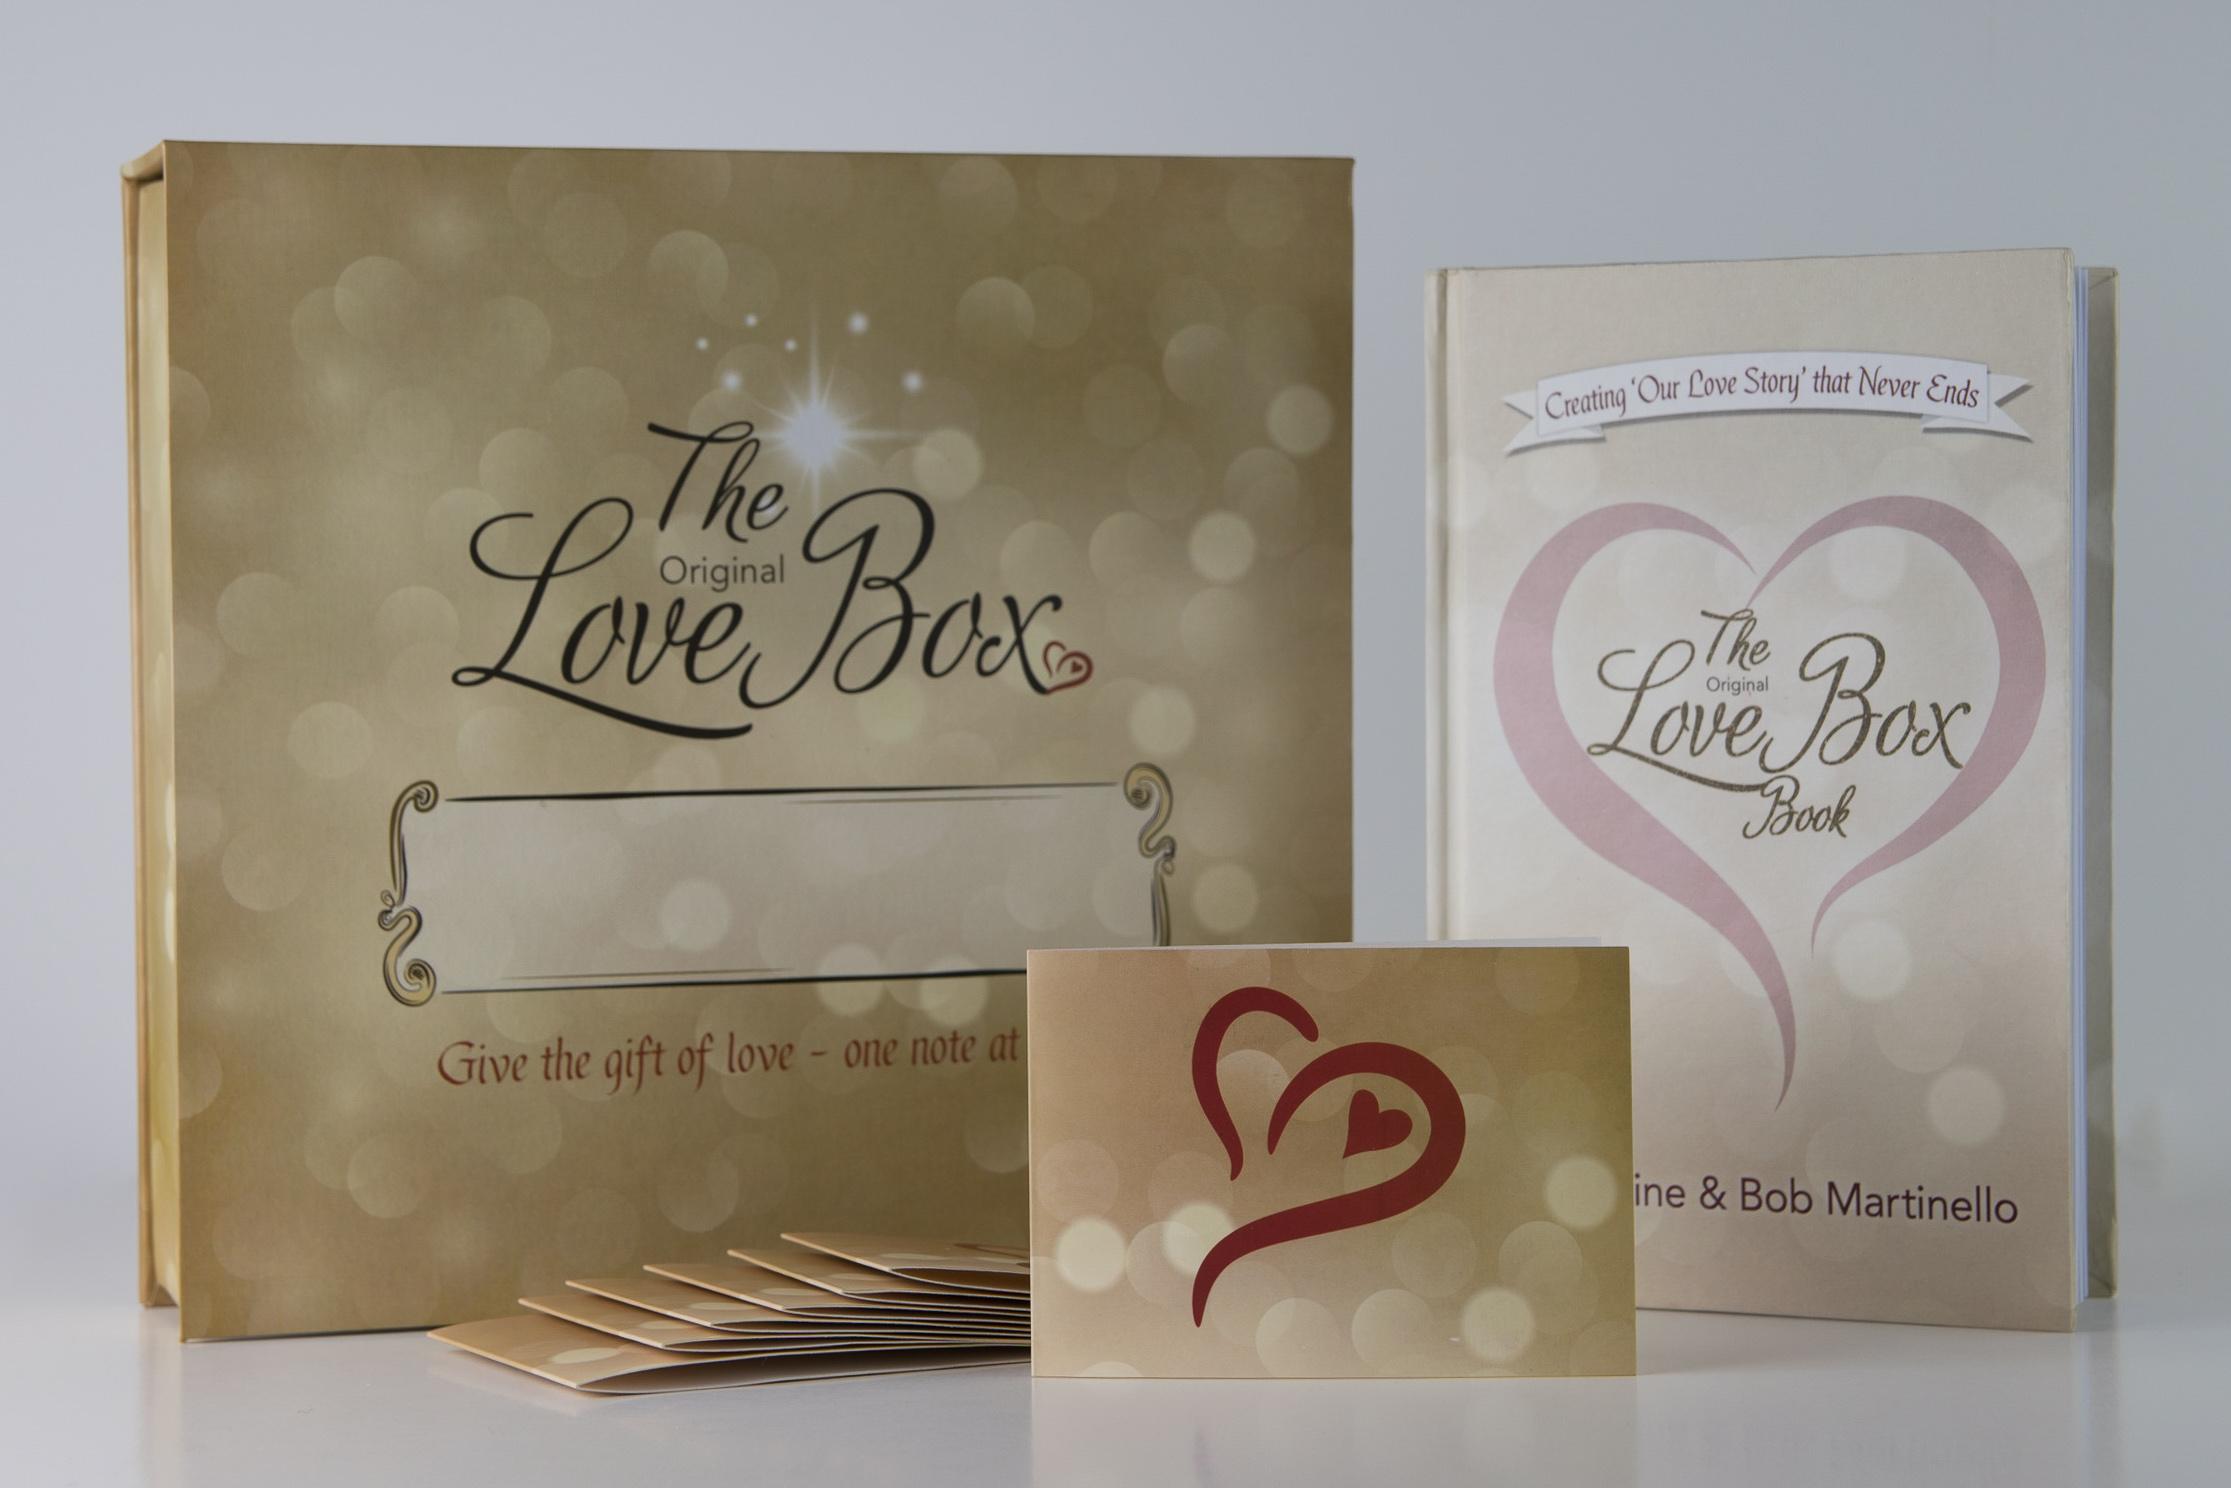 Original Love Box